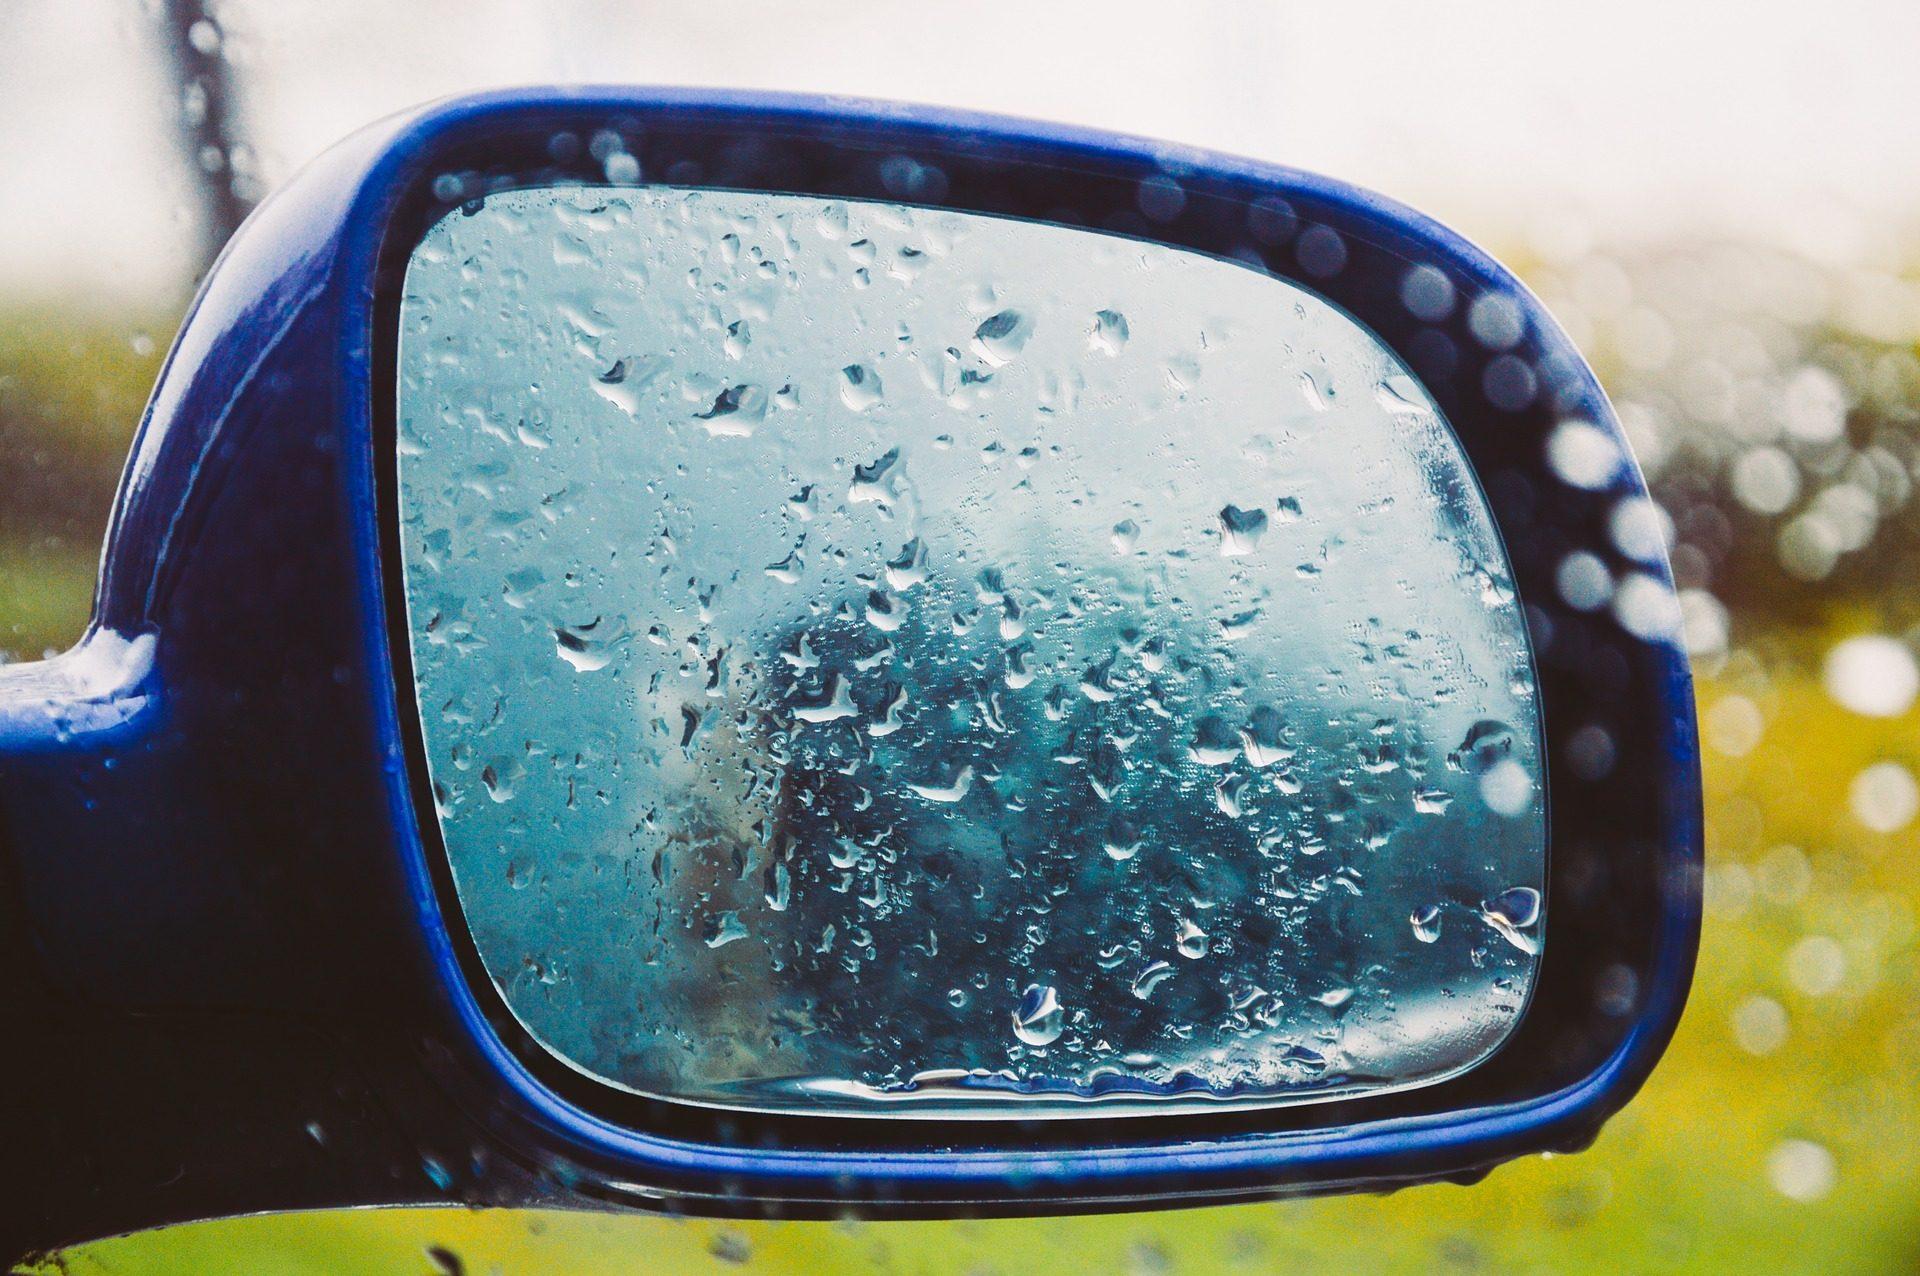 retrovisor, καθρέφτης, αυτοκίνητο, σταγόνες, νερό, βροχή - Wallpapers HD - Professor-falken.com